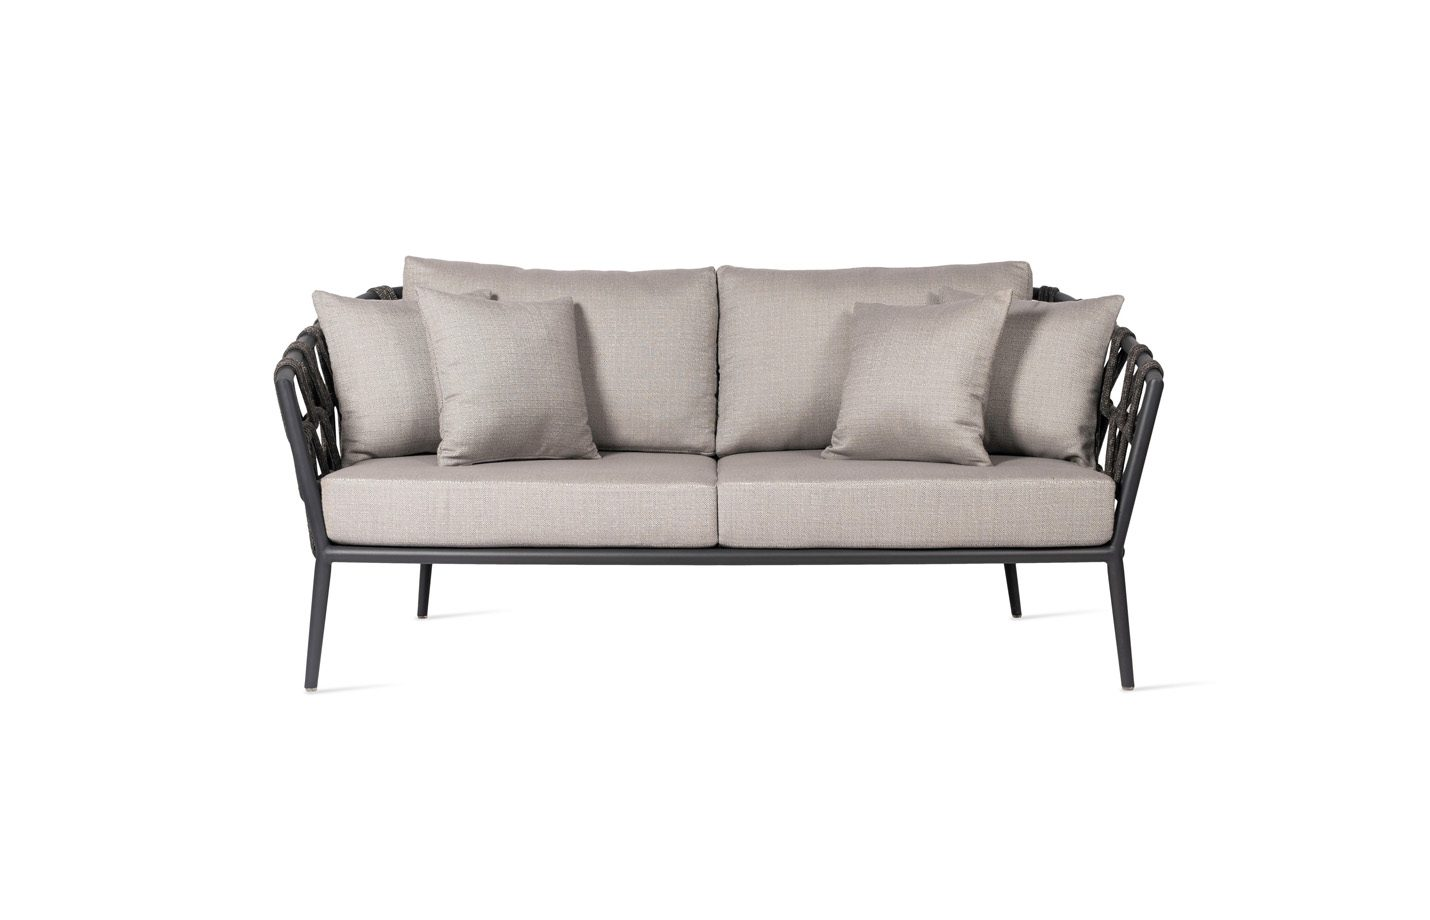 Leo-outdoor-lounge-sofa-01